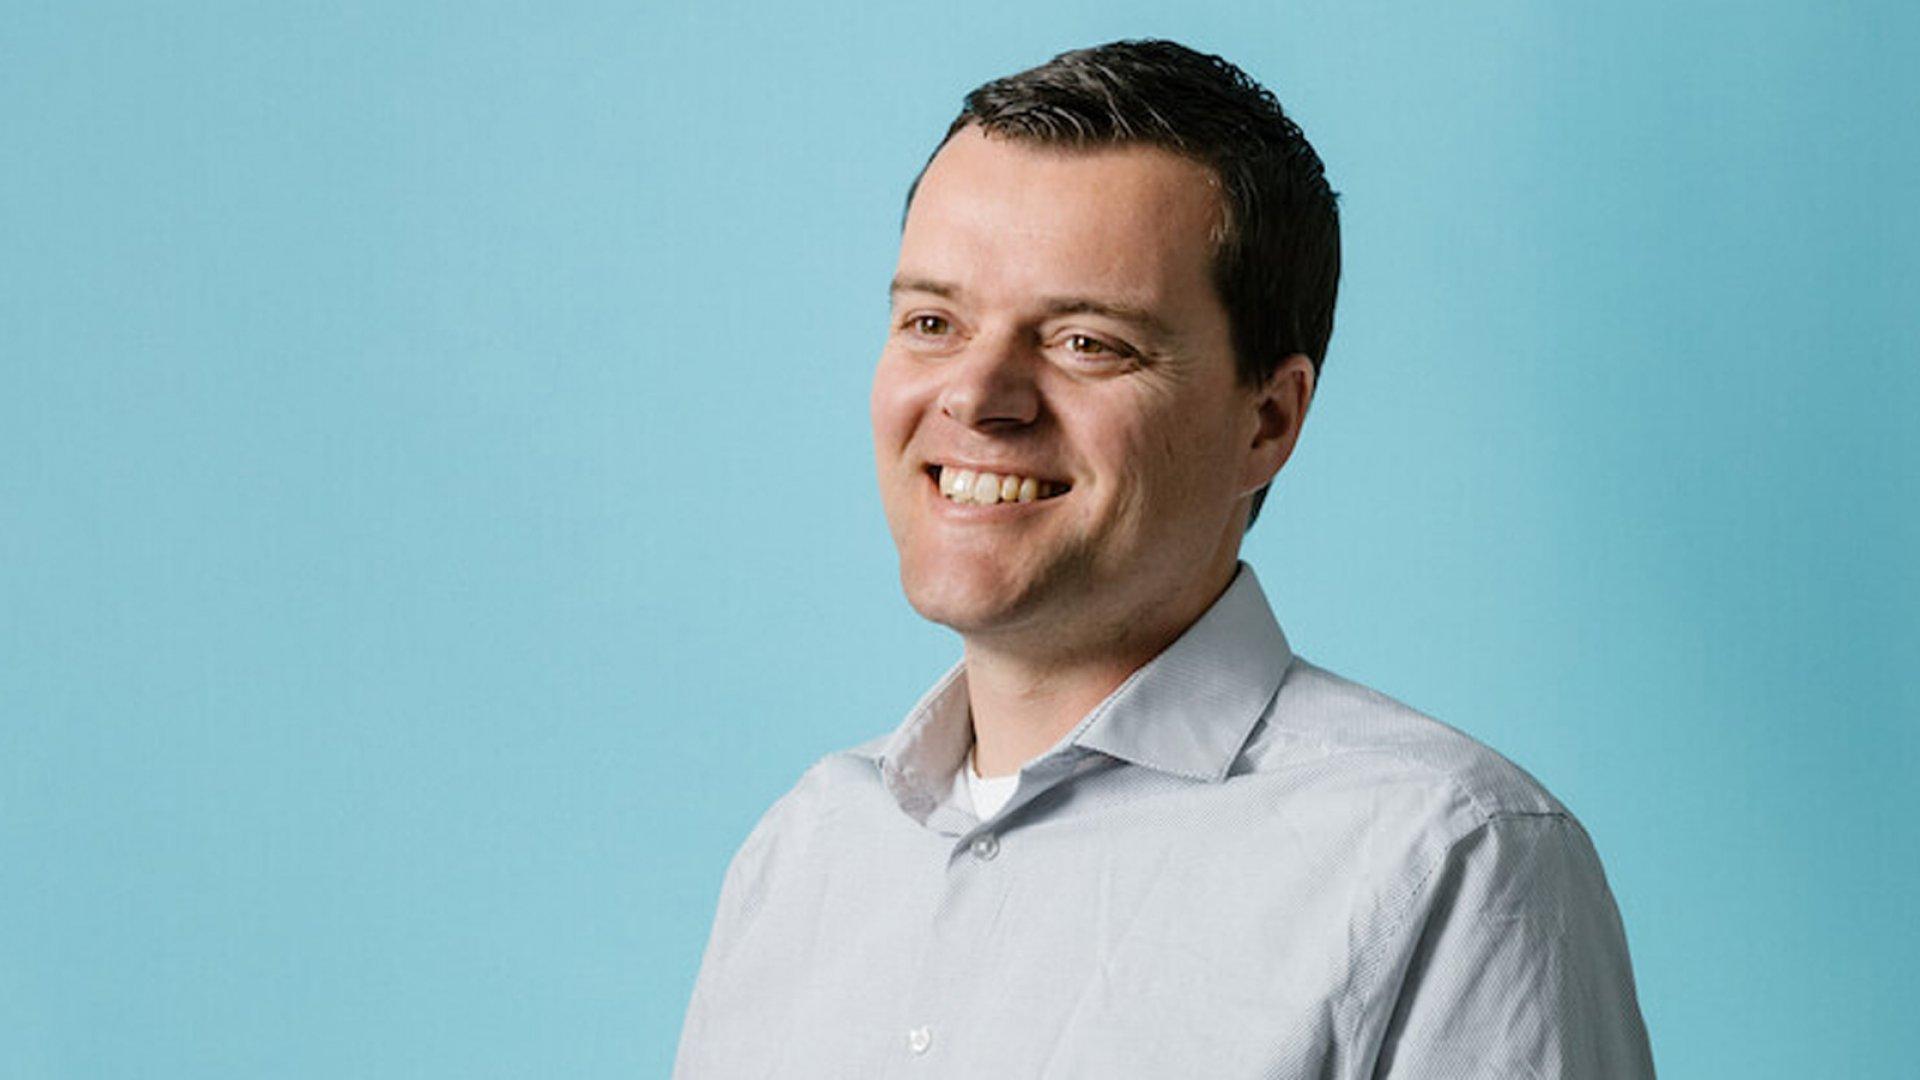 Sid Sijbrandij, co-founder and CEO of GitLab.